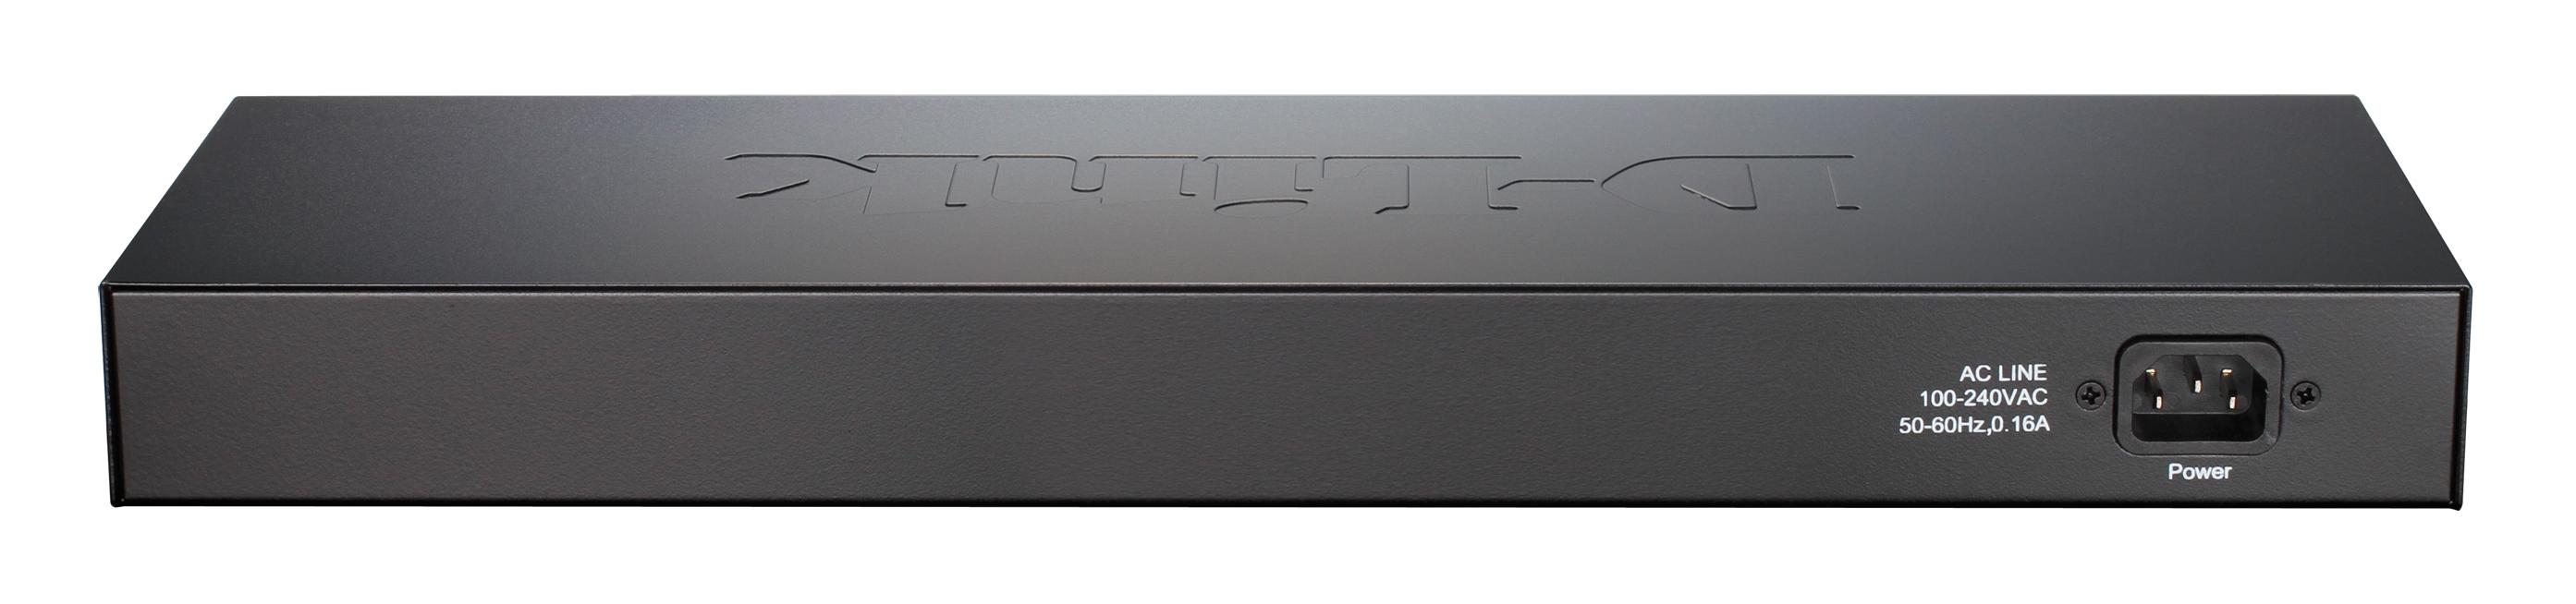 Link Des1026g 24port Rackmountable Gigabit Ethernet Layer 2 Switch